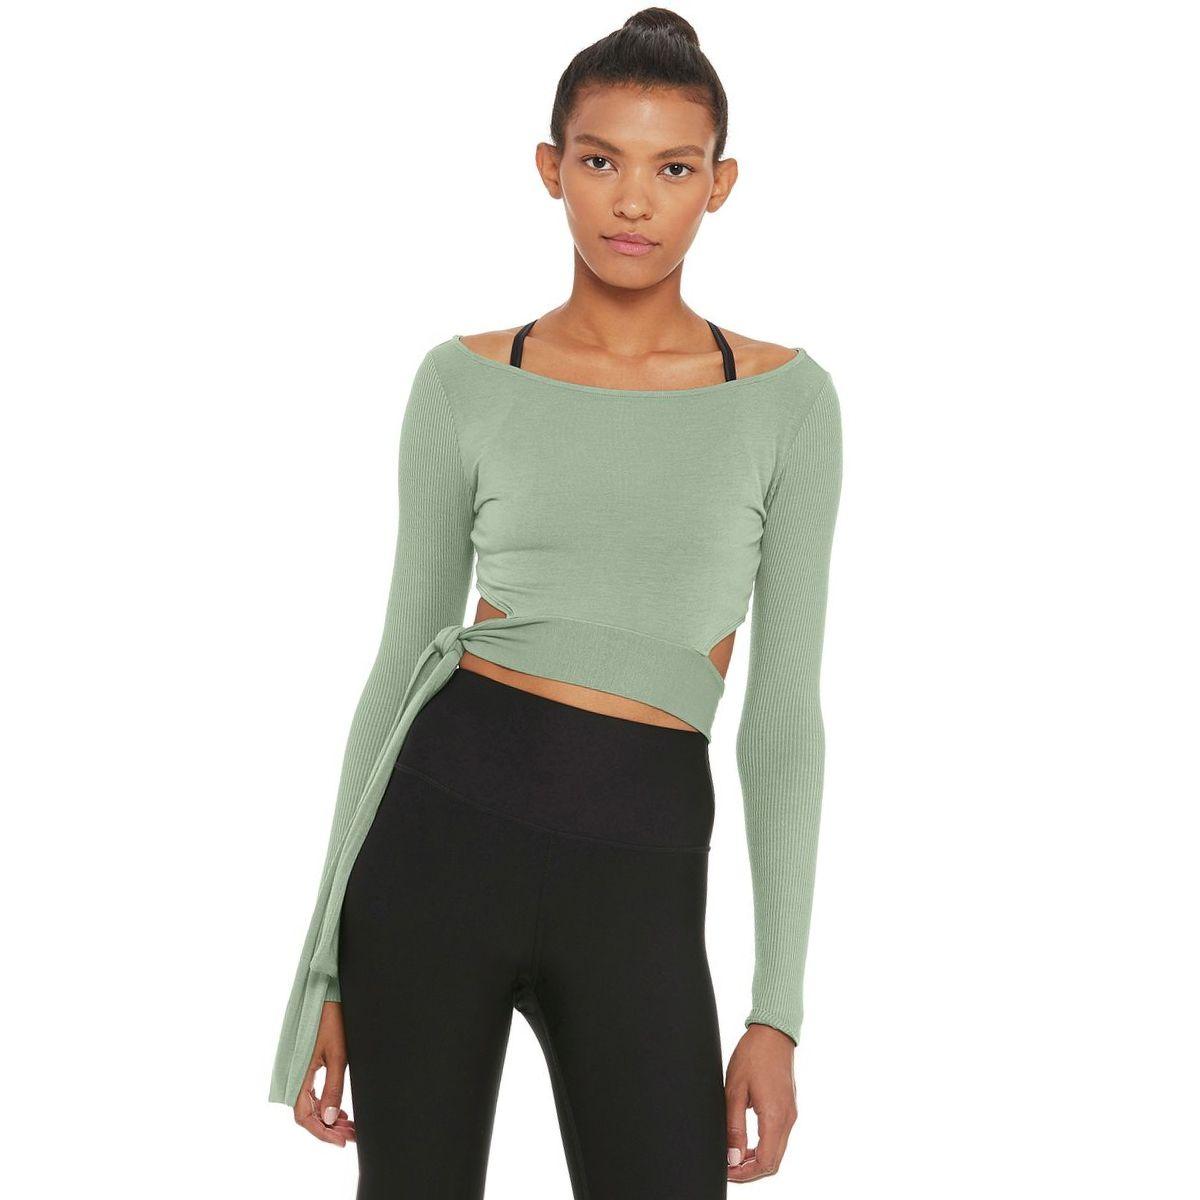 Alo Yoga Barre Long-Sleeve Top - Women's